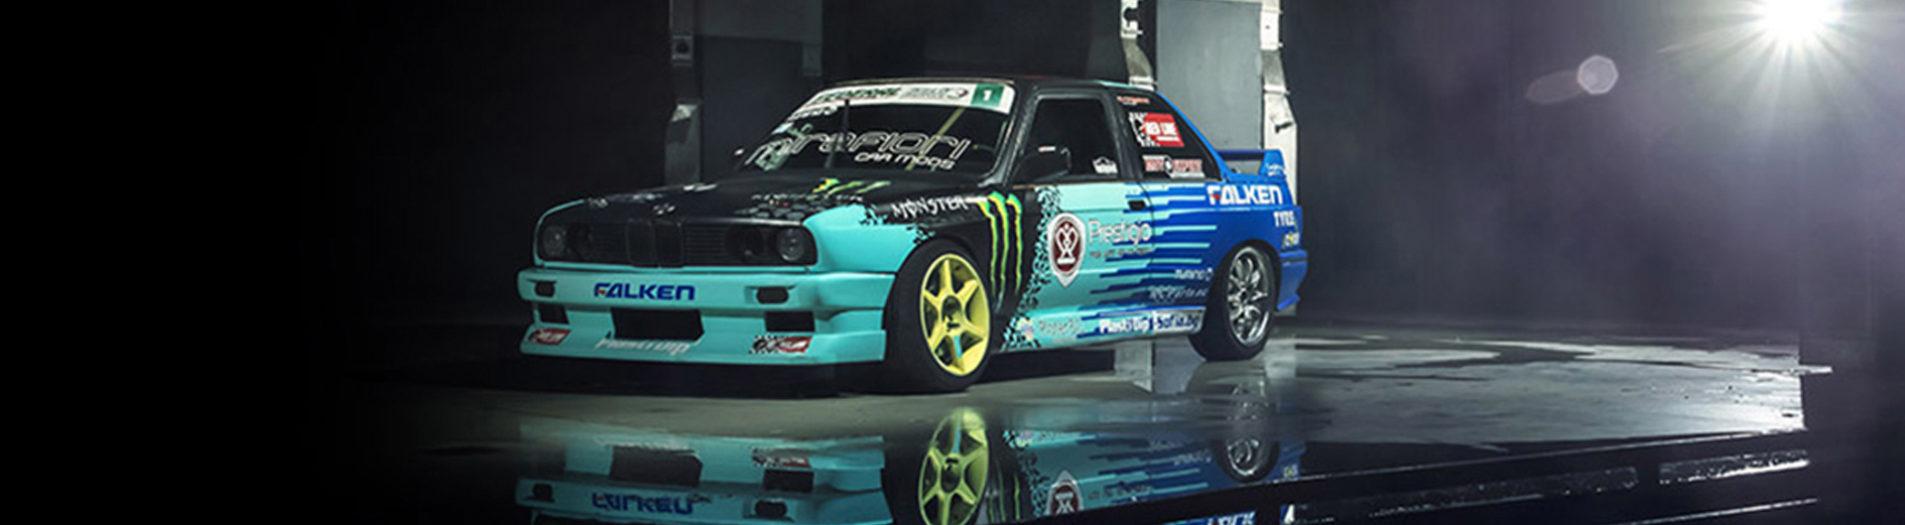 Next project: BMW ///M3 E30 / 1988 / Alex Yazov